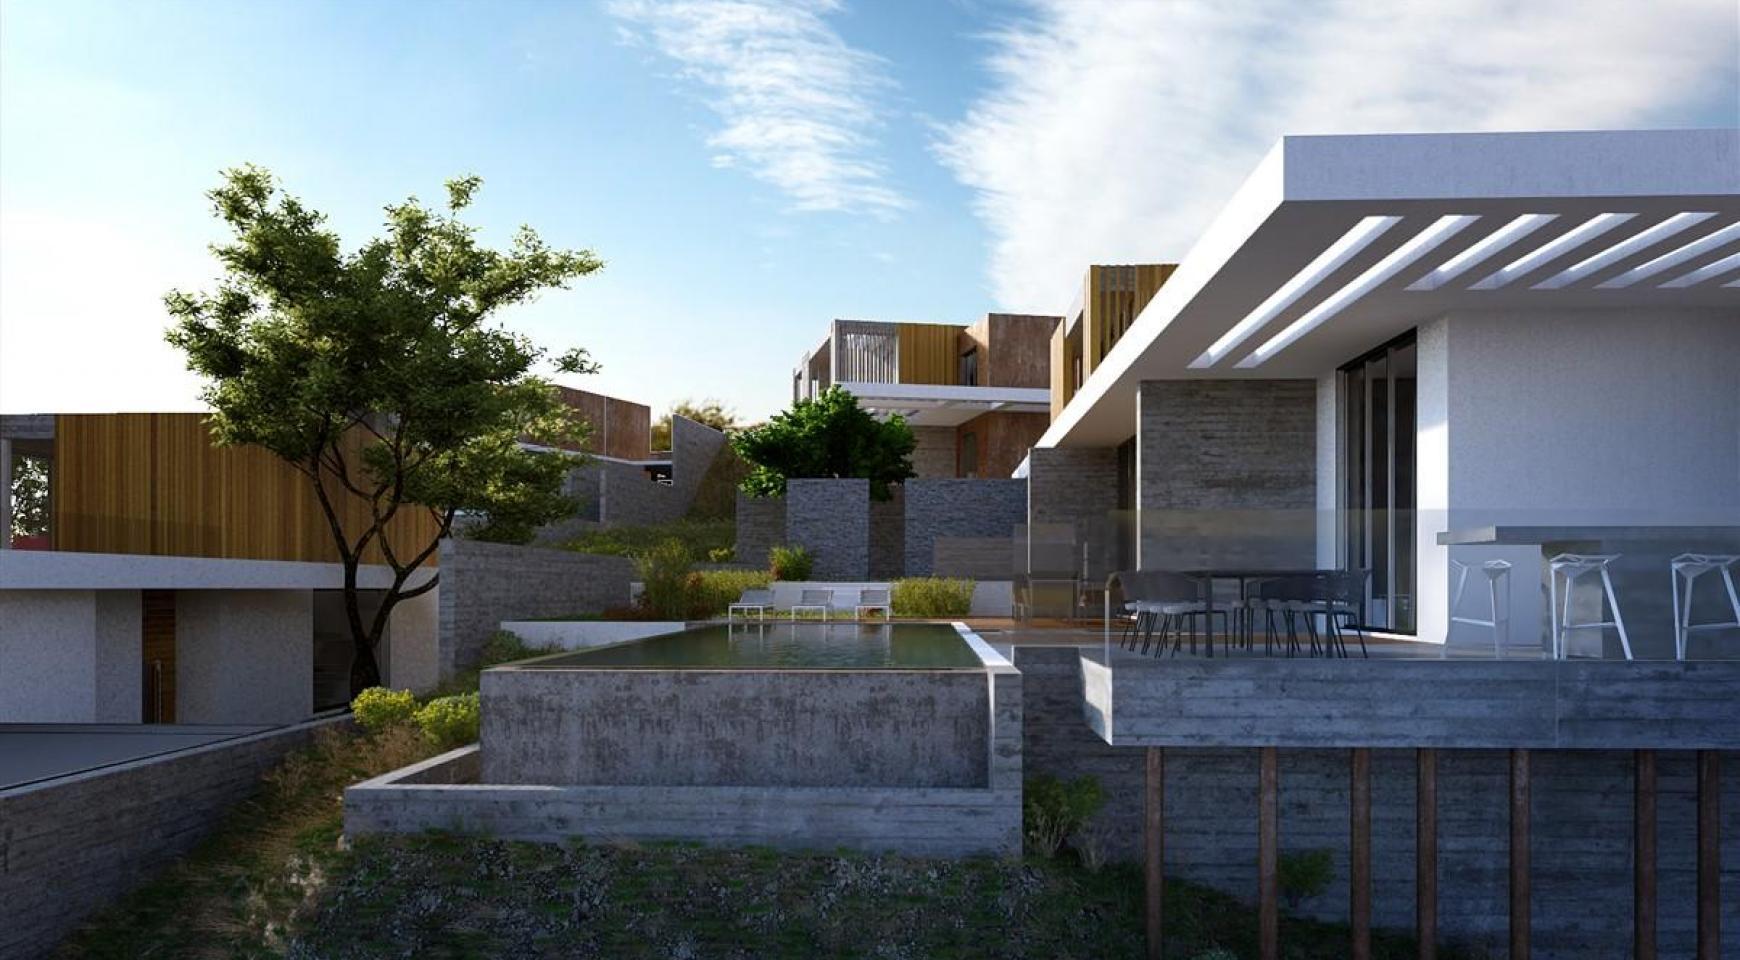 Exclusive 3 Bedroom Villa with Stunning Views in Germasogeia - 3